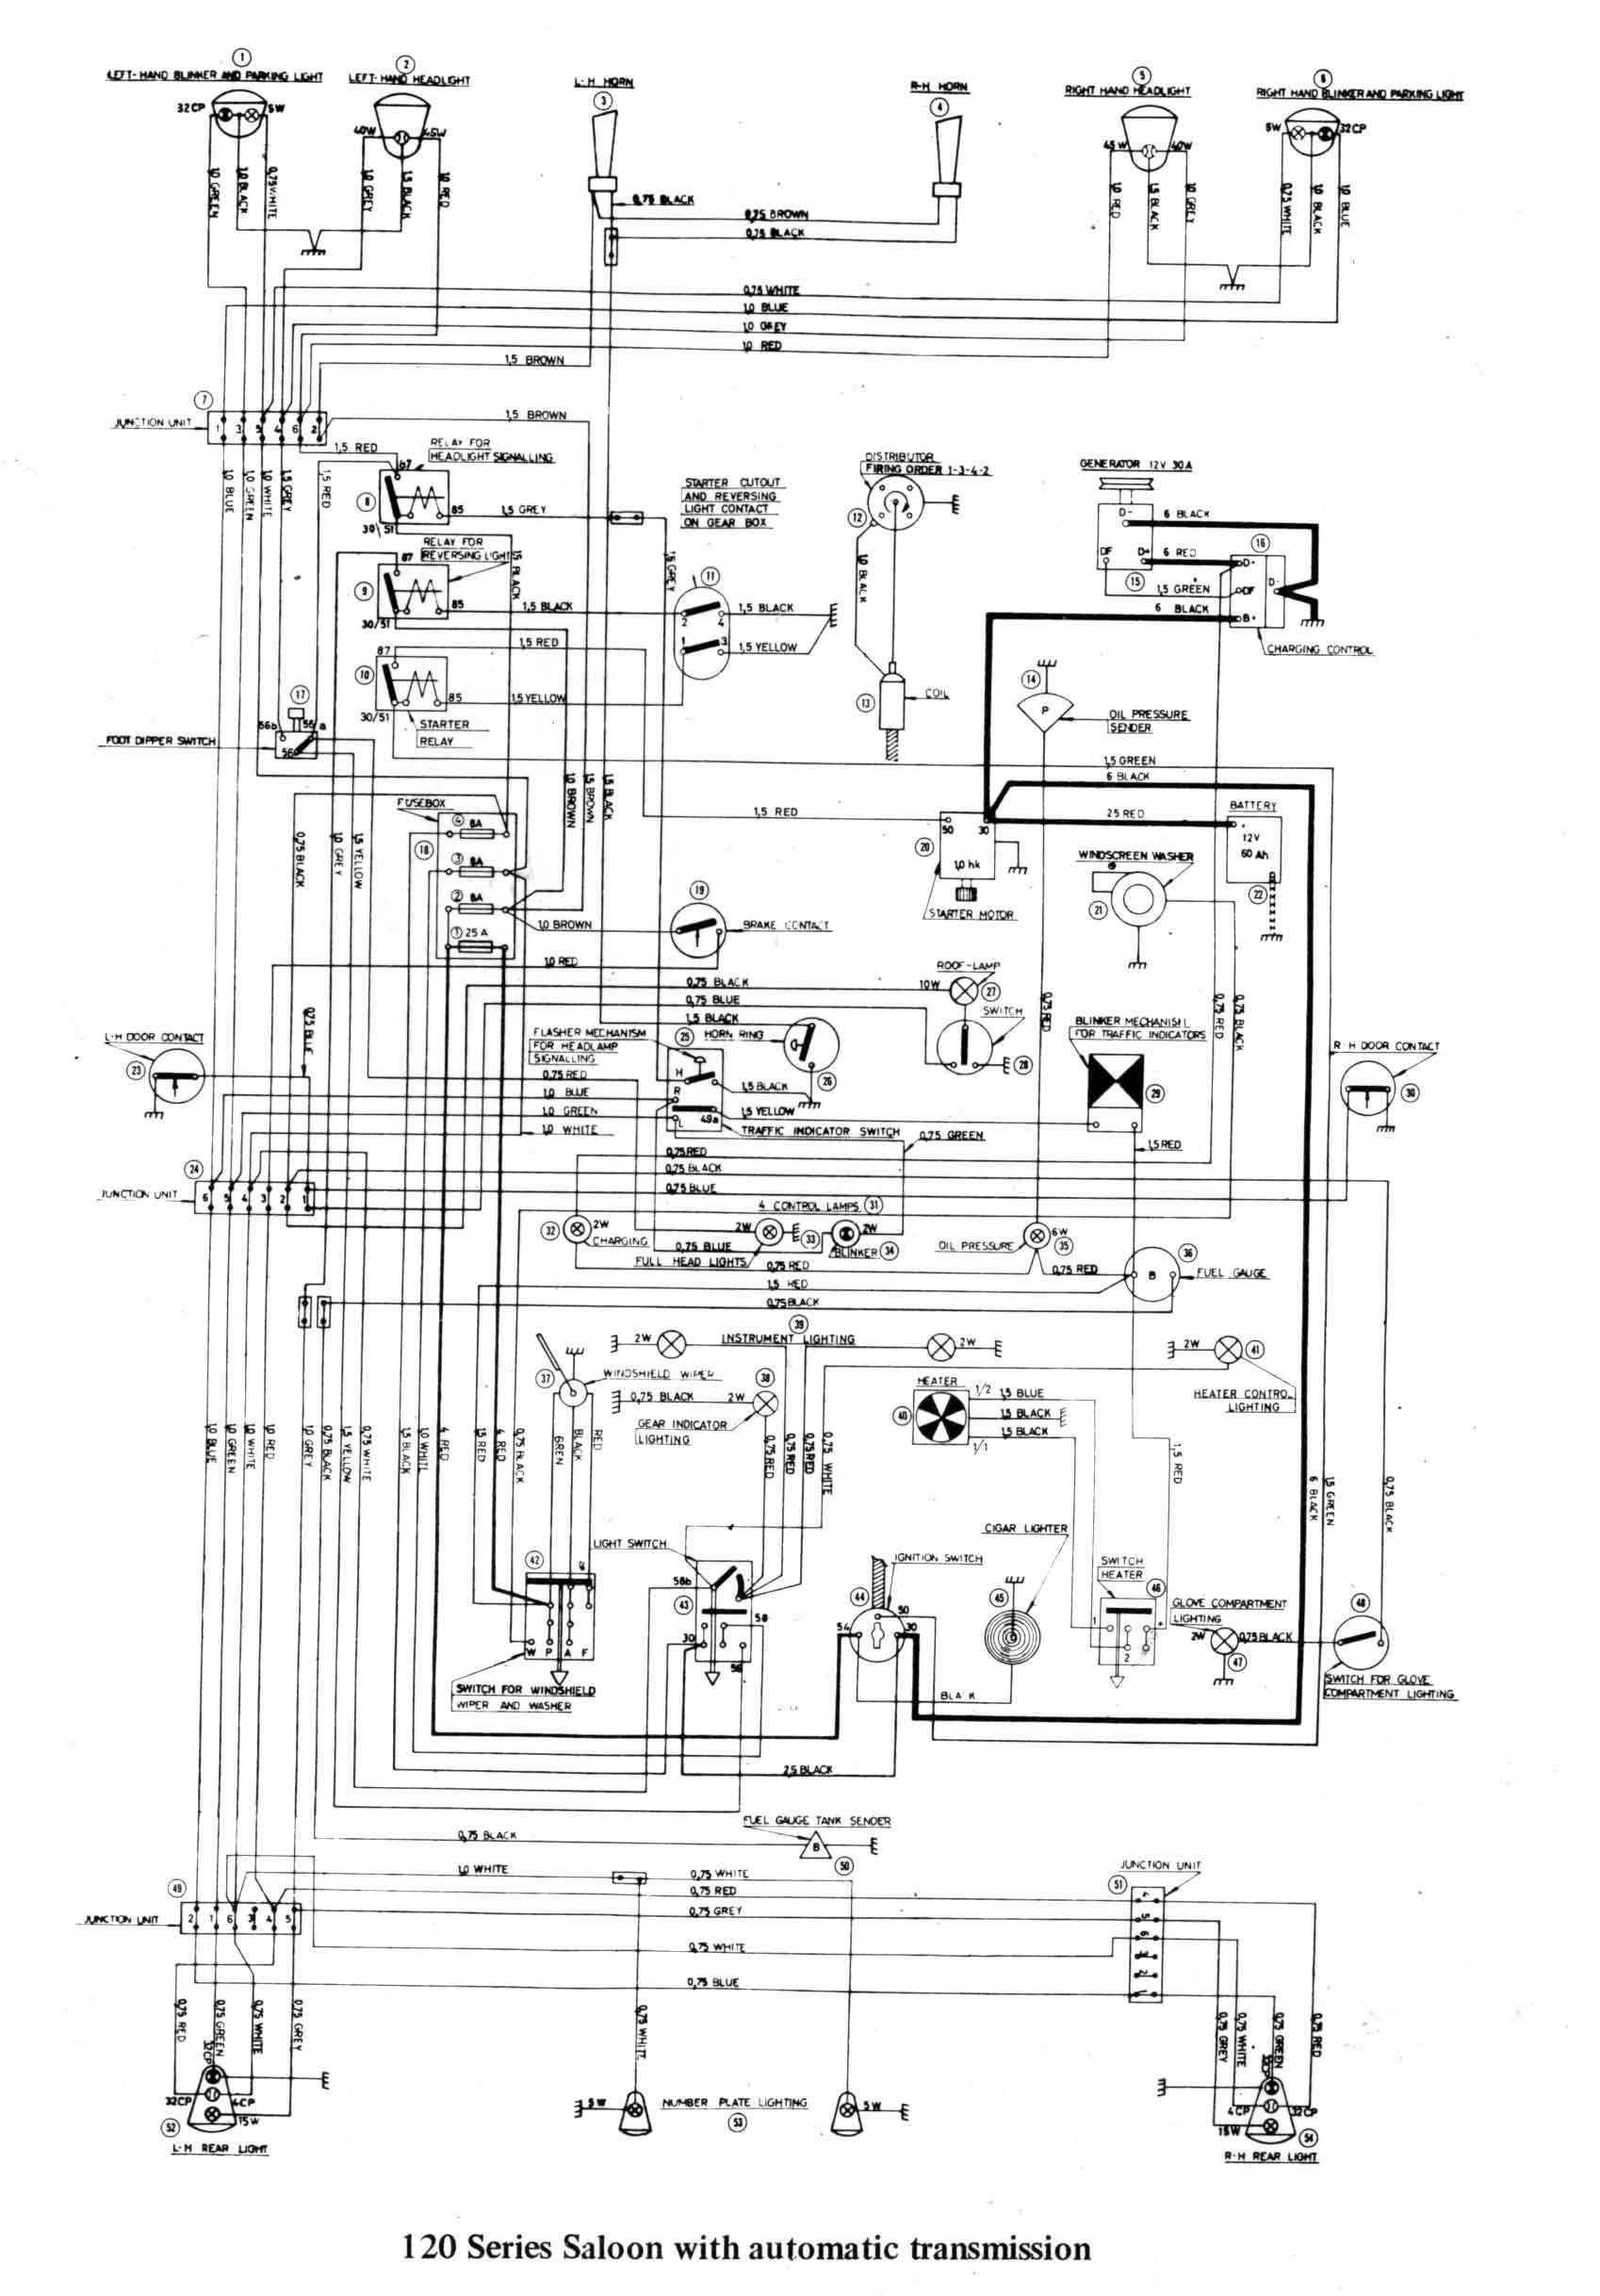 Car Electrical Wiring Diagrams Wiring Diagram Car Alternator New Automobile Alternator Wiring Of Car Electrical Wiring Diagrams